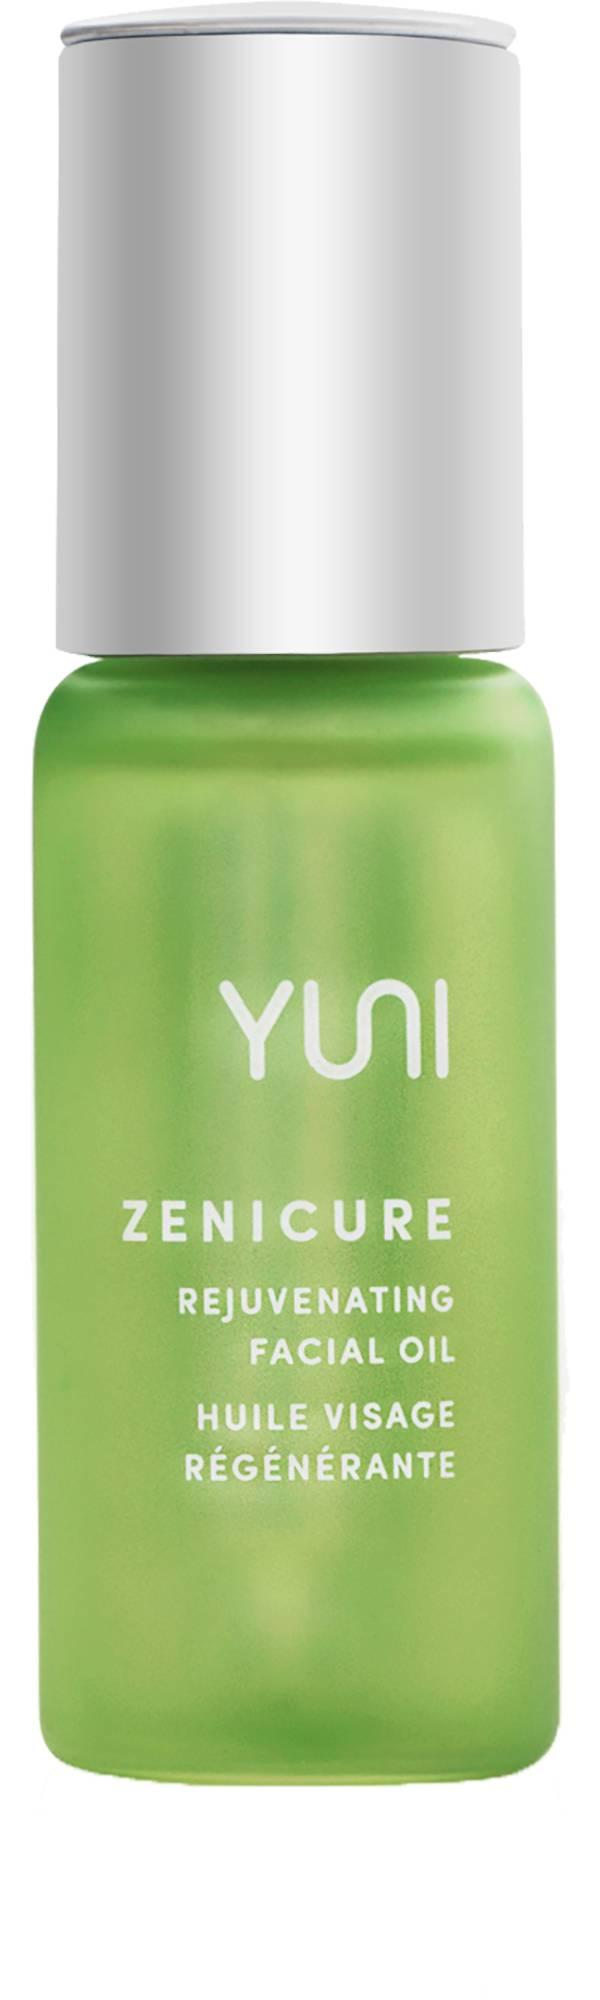 YUNI Beauty Zenicure Rejuvenating Facial Oil product image